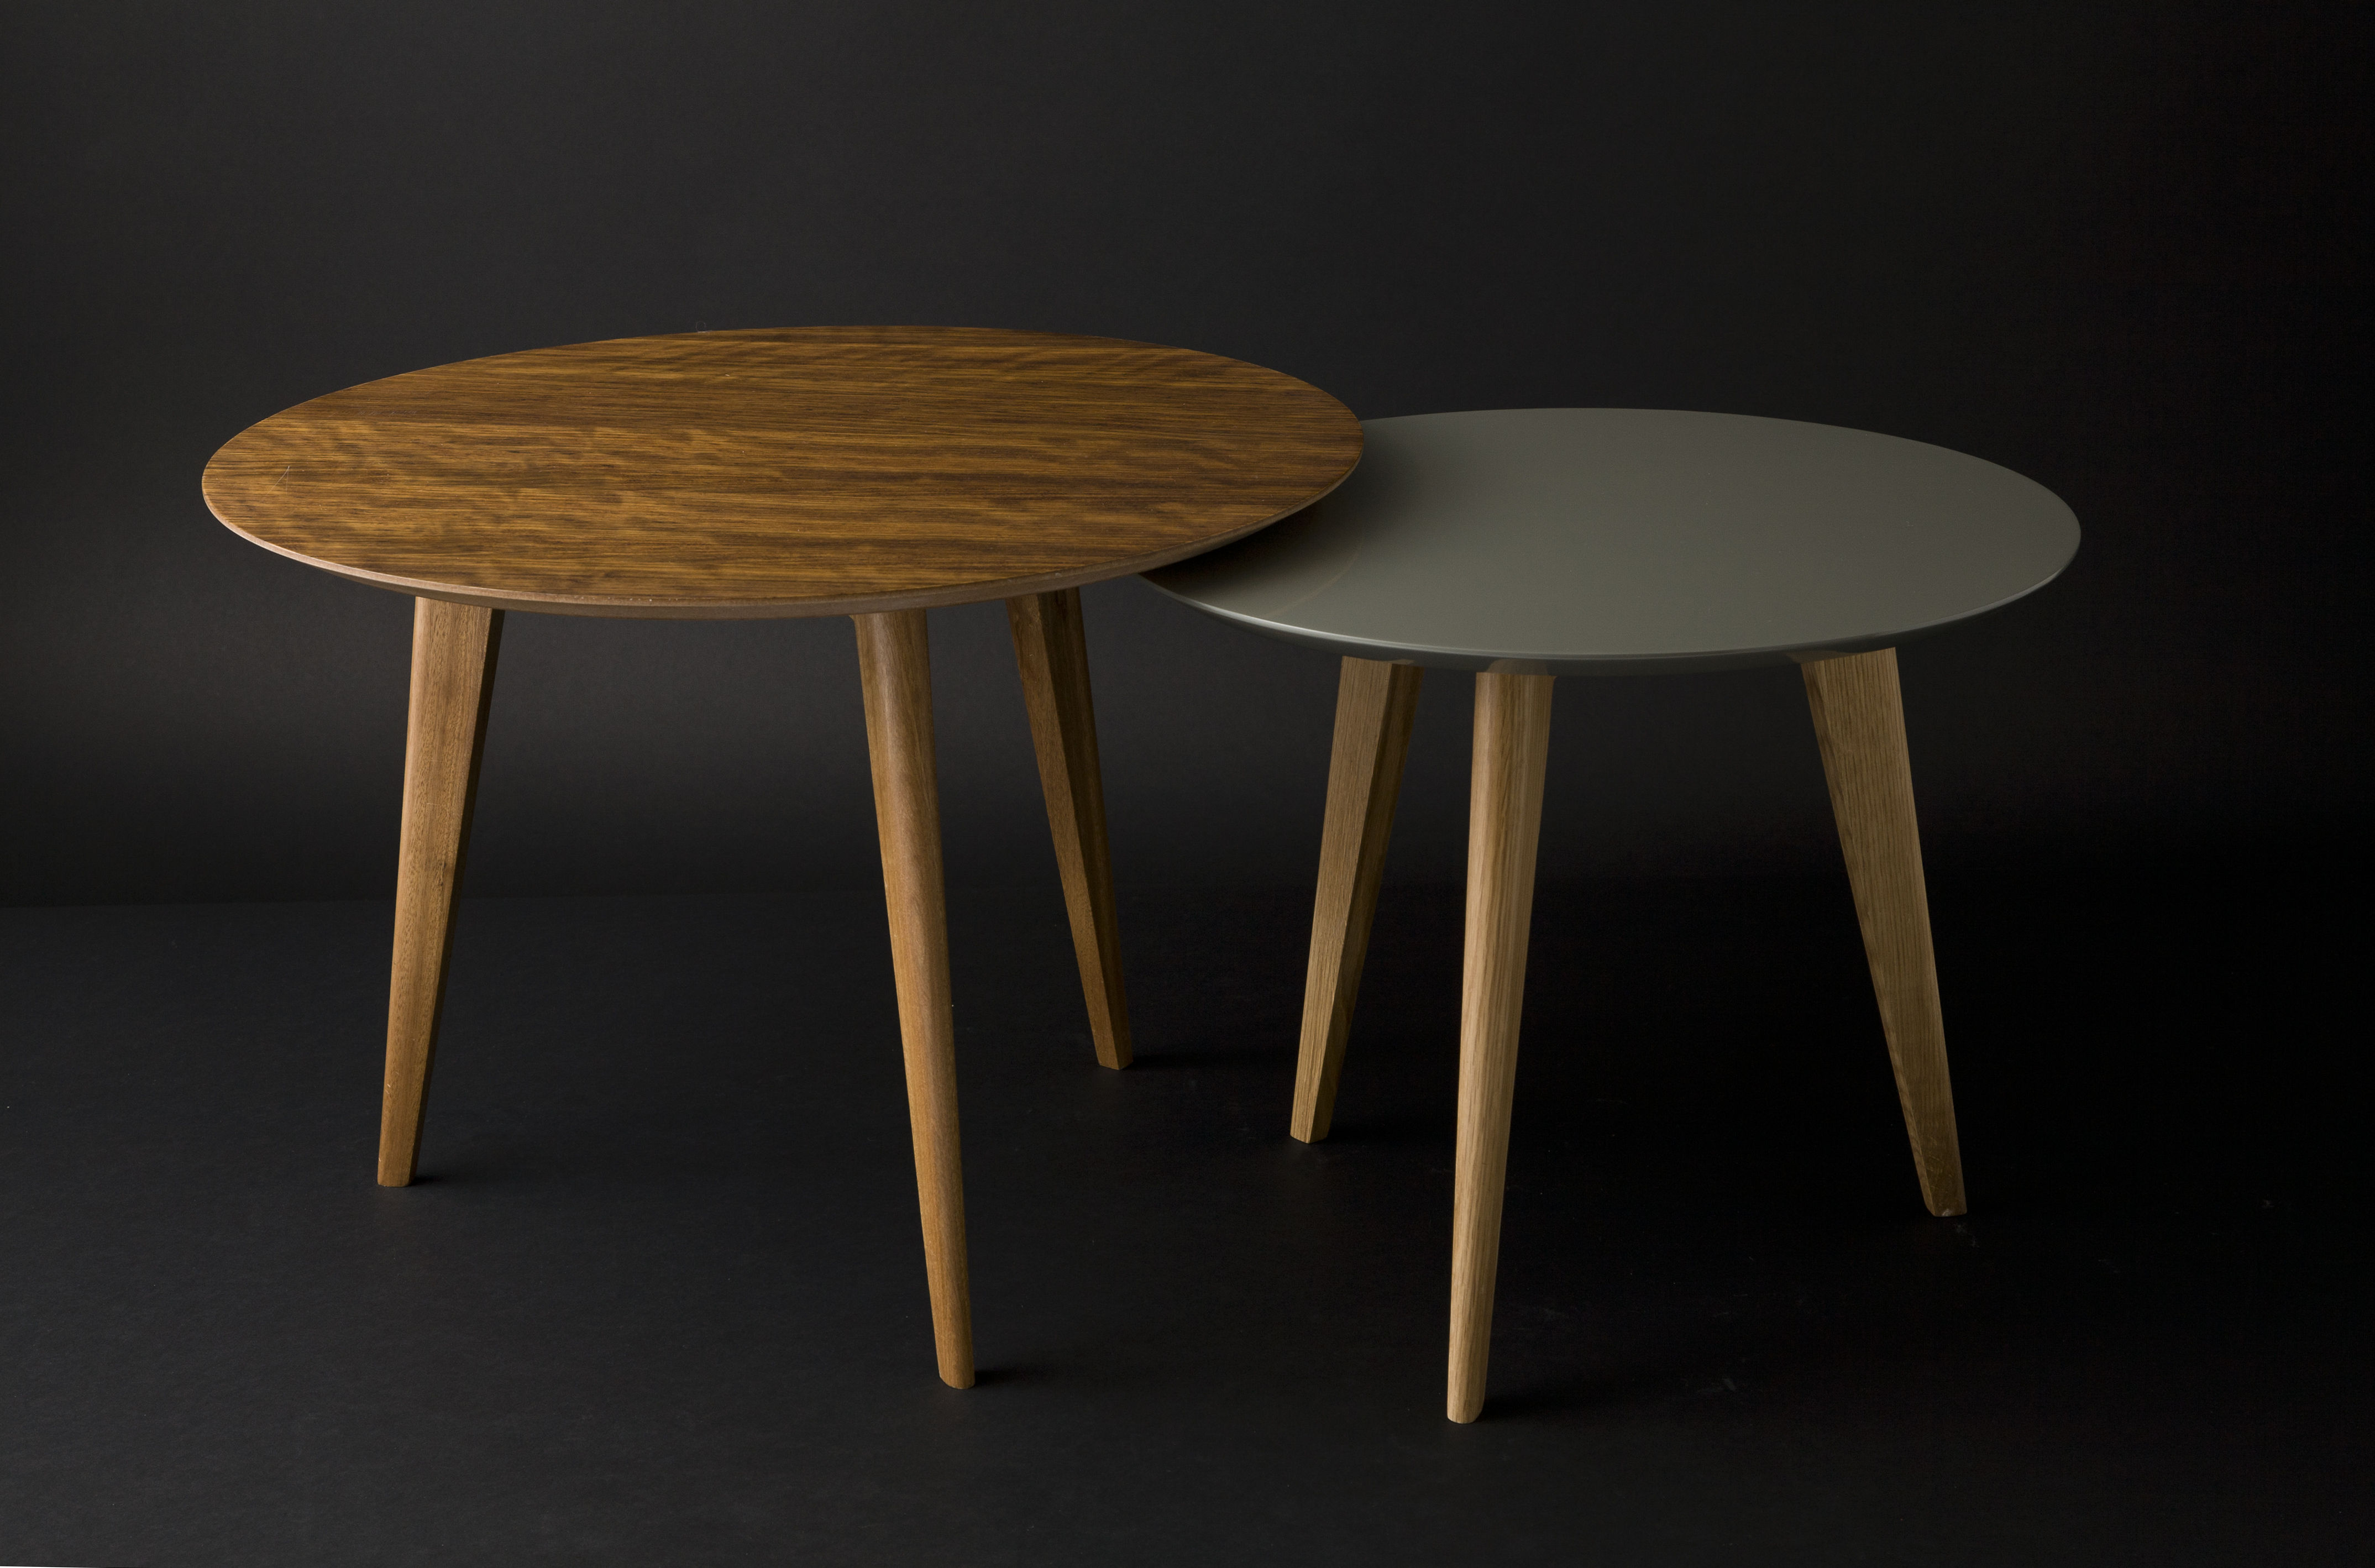 table basse lalinde large 55cm pieds noirs gris clair. Black Bedroom Furniture Sets. Home Design Ideas